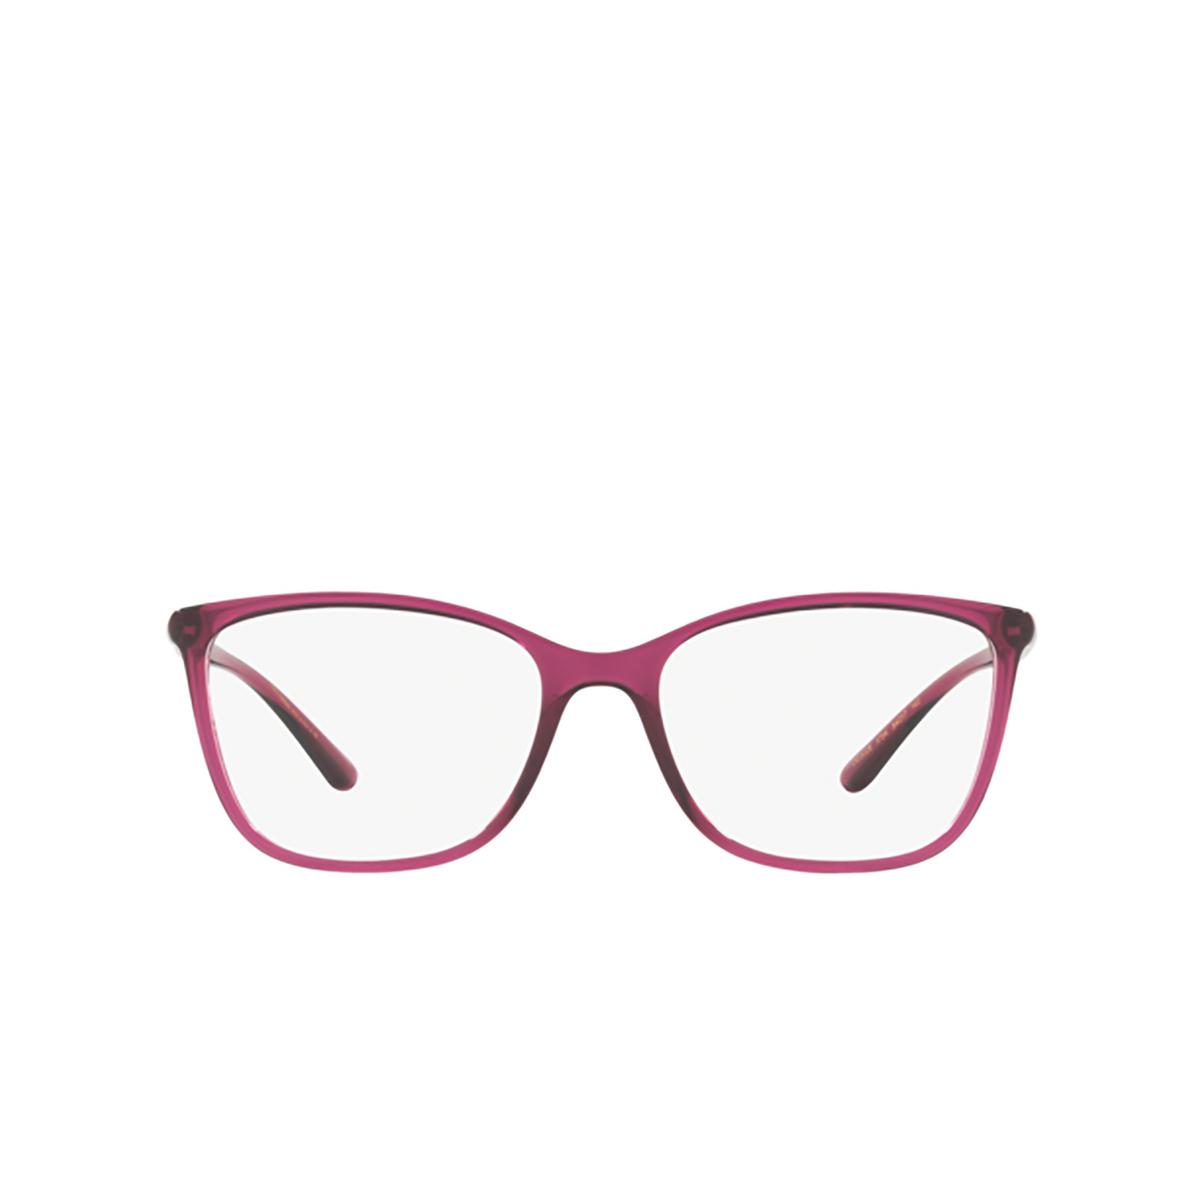 Dolce & Gabbana® Rectangle Eyeglasses: DG5026 color Transparent Dark Cherry 1754 - front view.